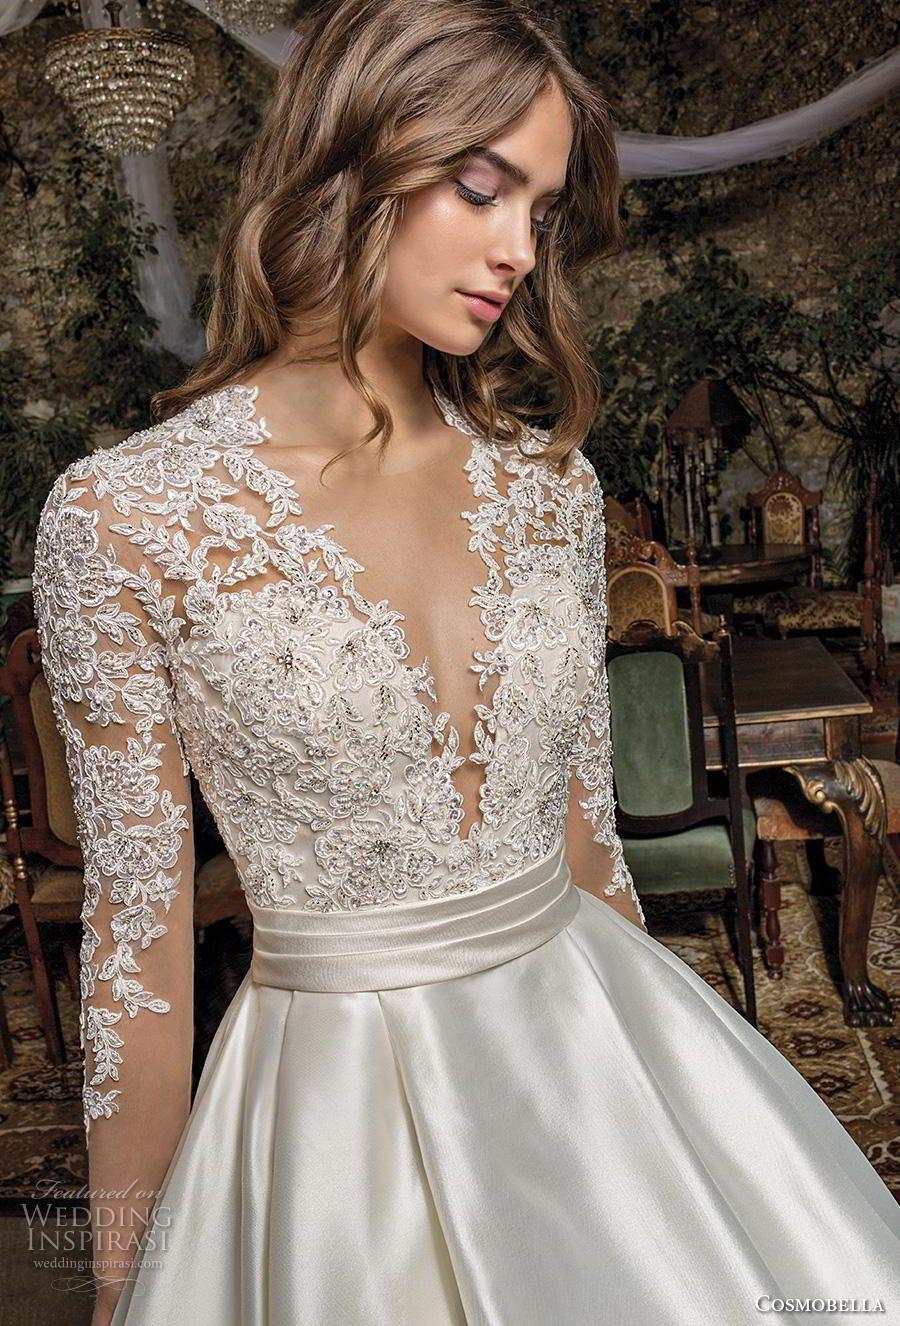 Cosmobella 2019 Wedding Dresses Wedding Inspirasi Wedding Dress Styles Bridal Dresses Long Wedding Dresses [ 1326 x 900 Pixel ]